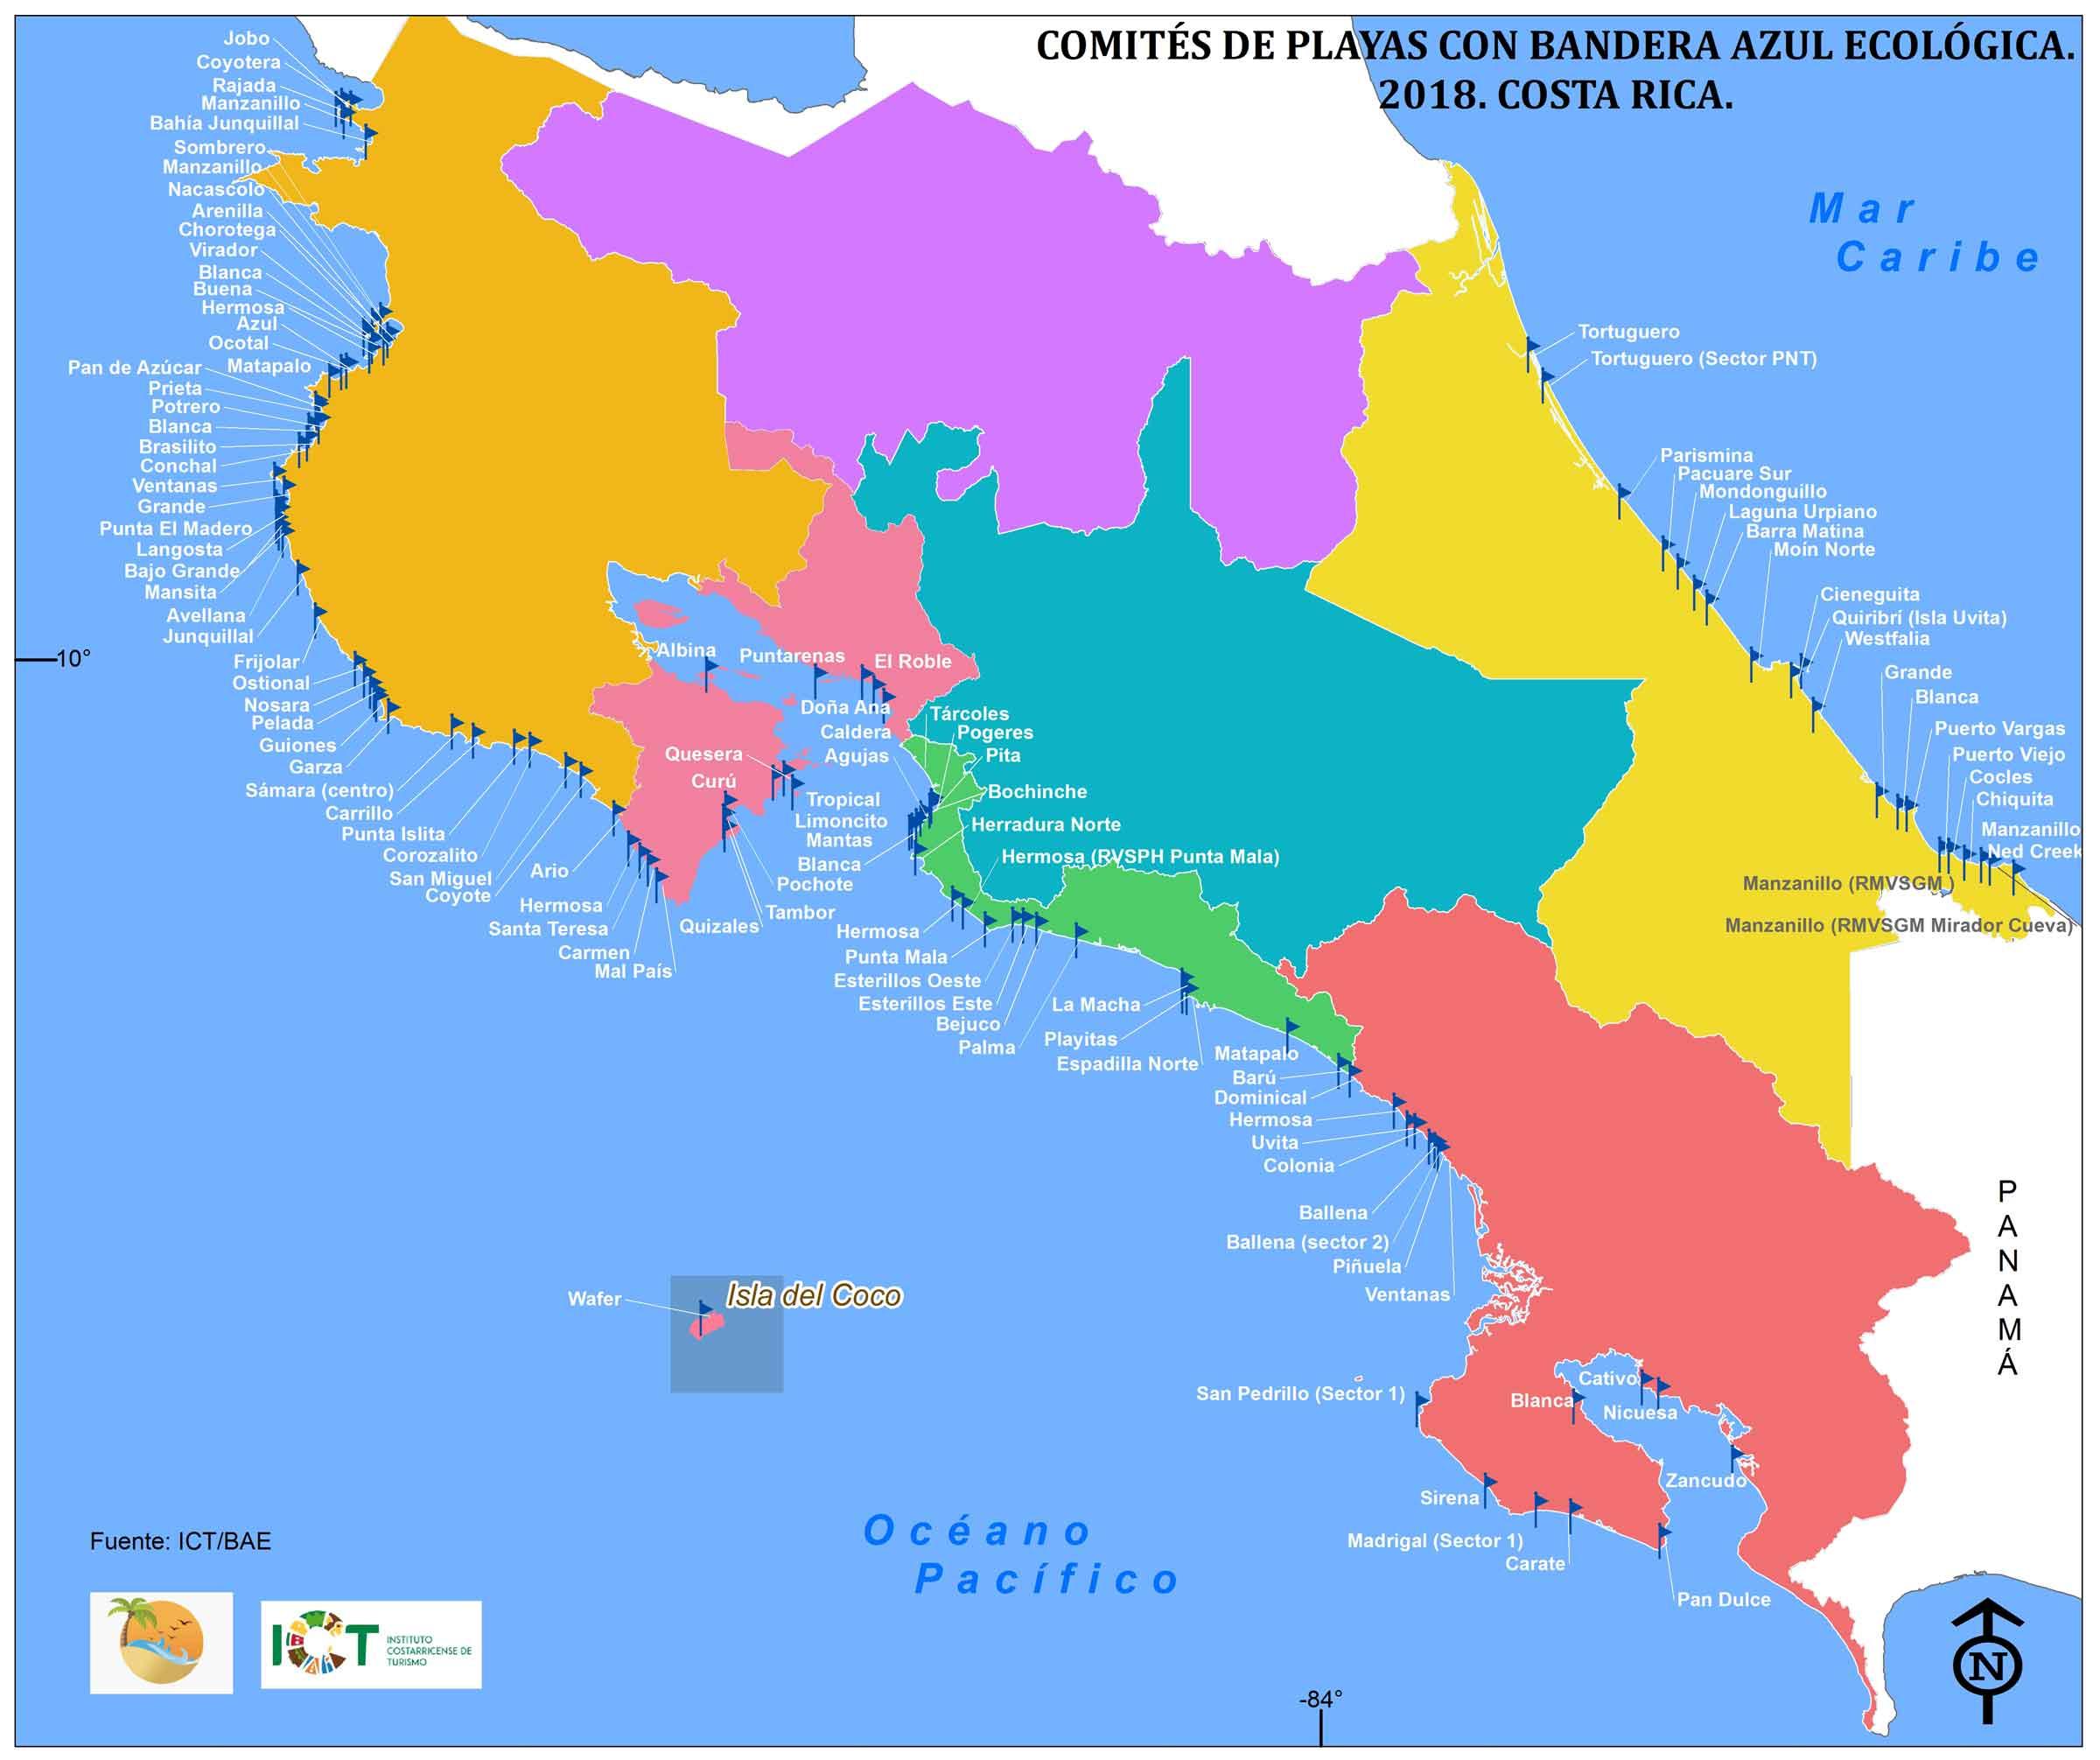 Mapa De Costa Rica.Ecologic Blue Flag Program Instituto Costarricense De